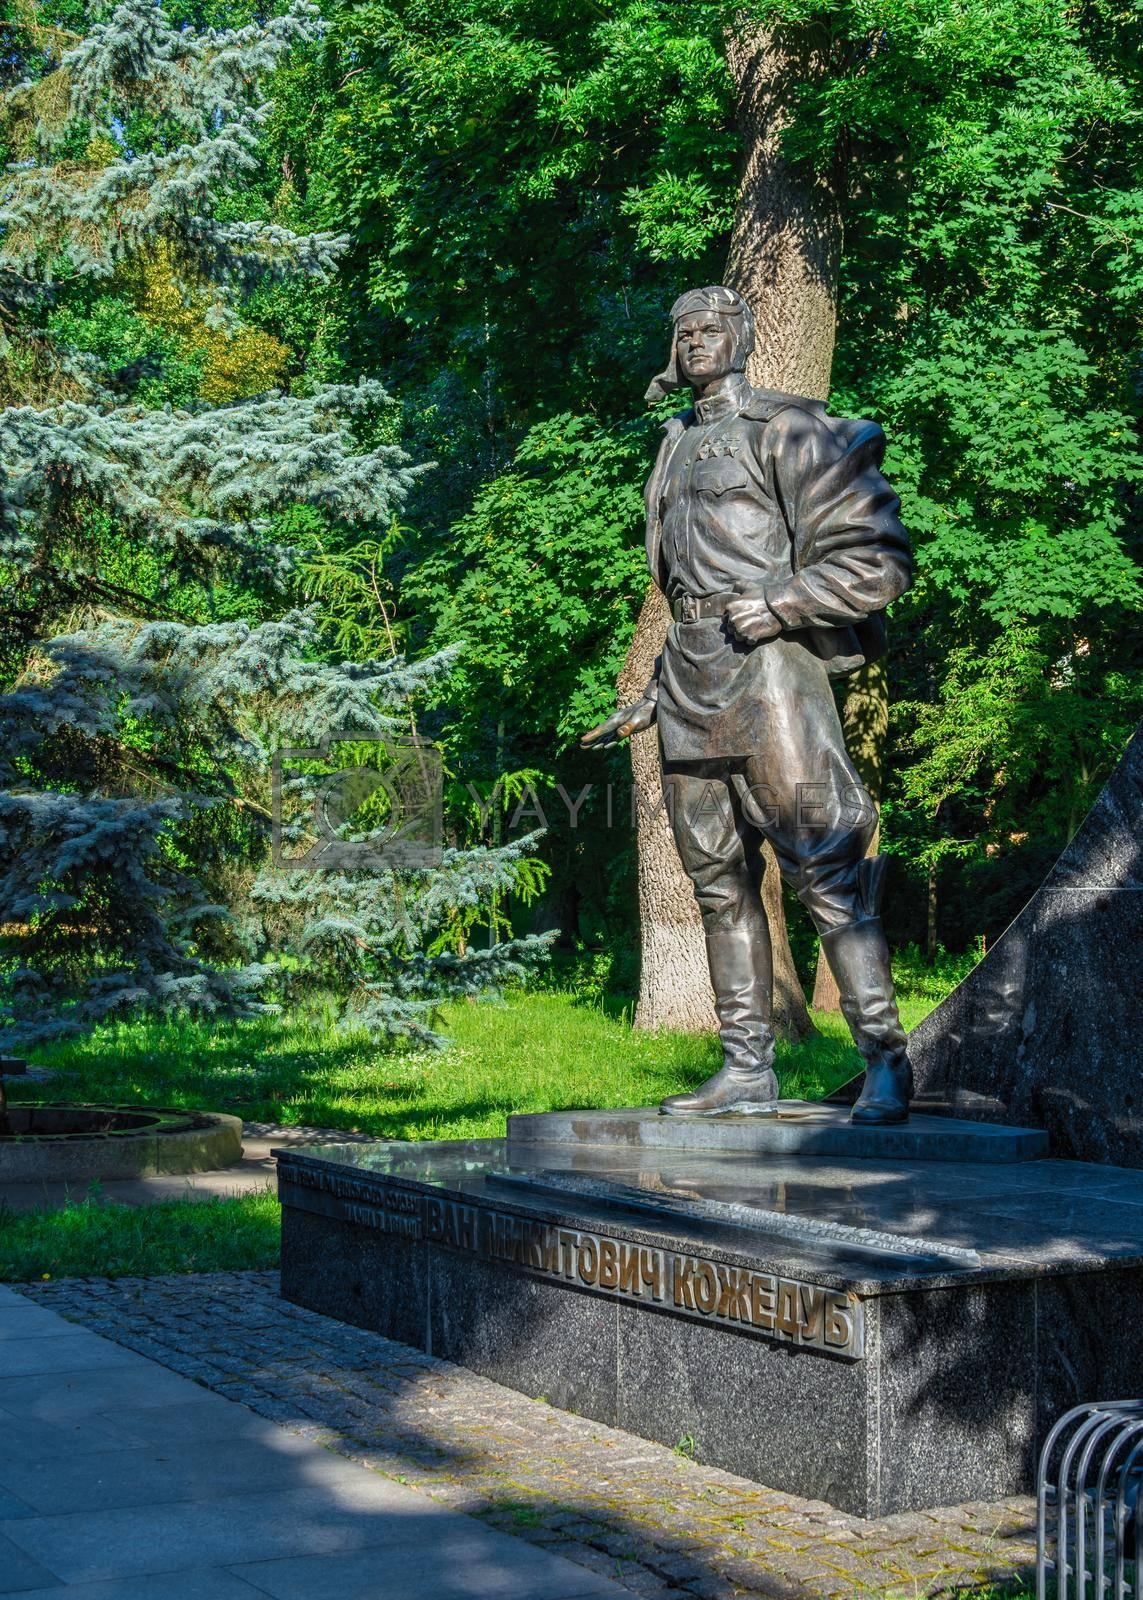 Kyiv, Ukraine 07.11.2020.  Monument to Ivan Kozhedub in the Park of Eternal Glory in Kyiv, Ukraine, on a sunny summer morning